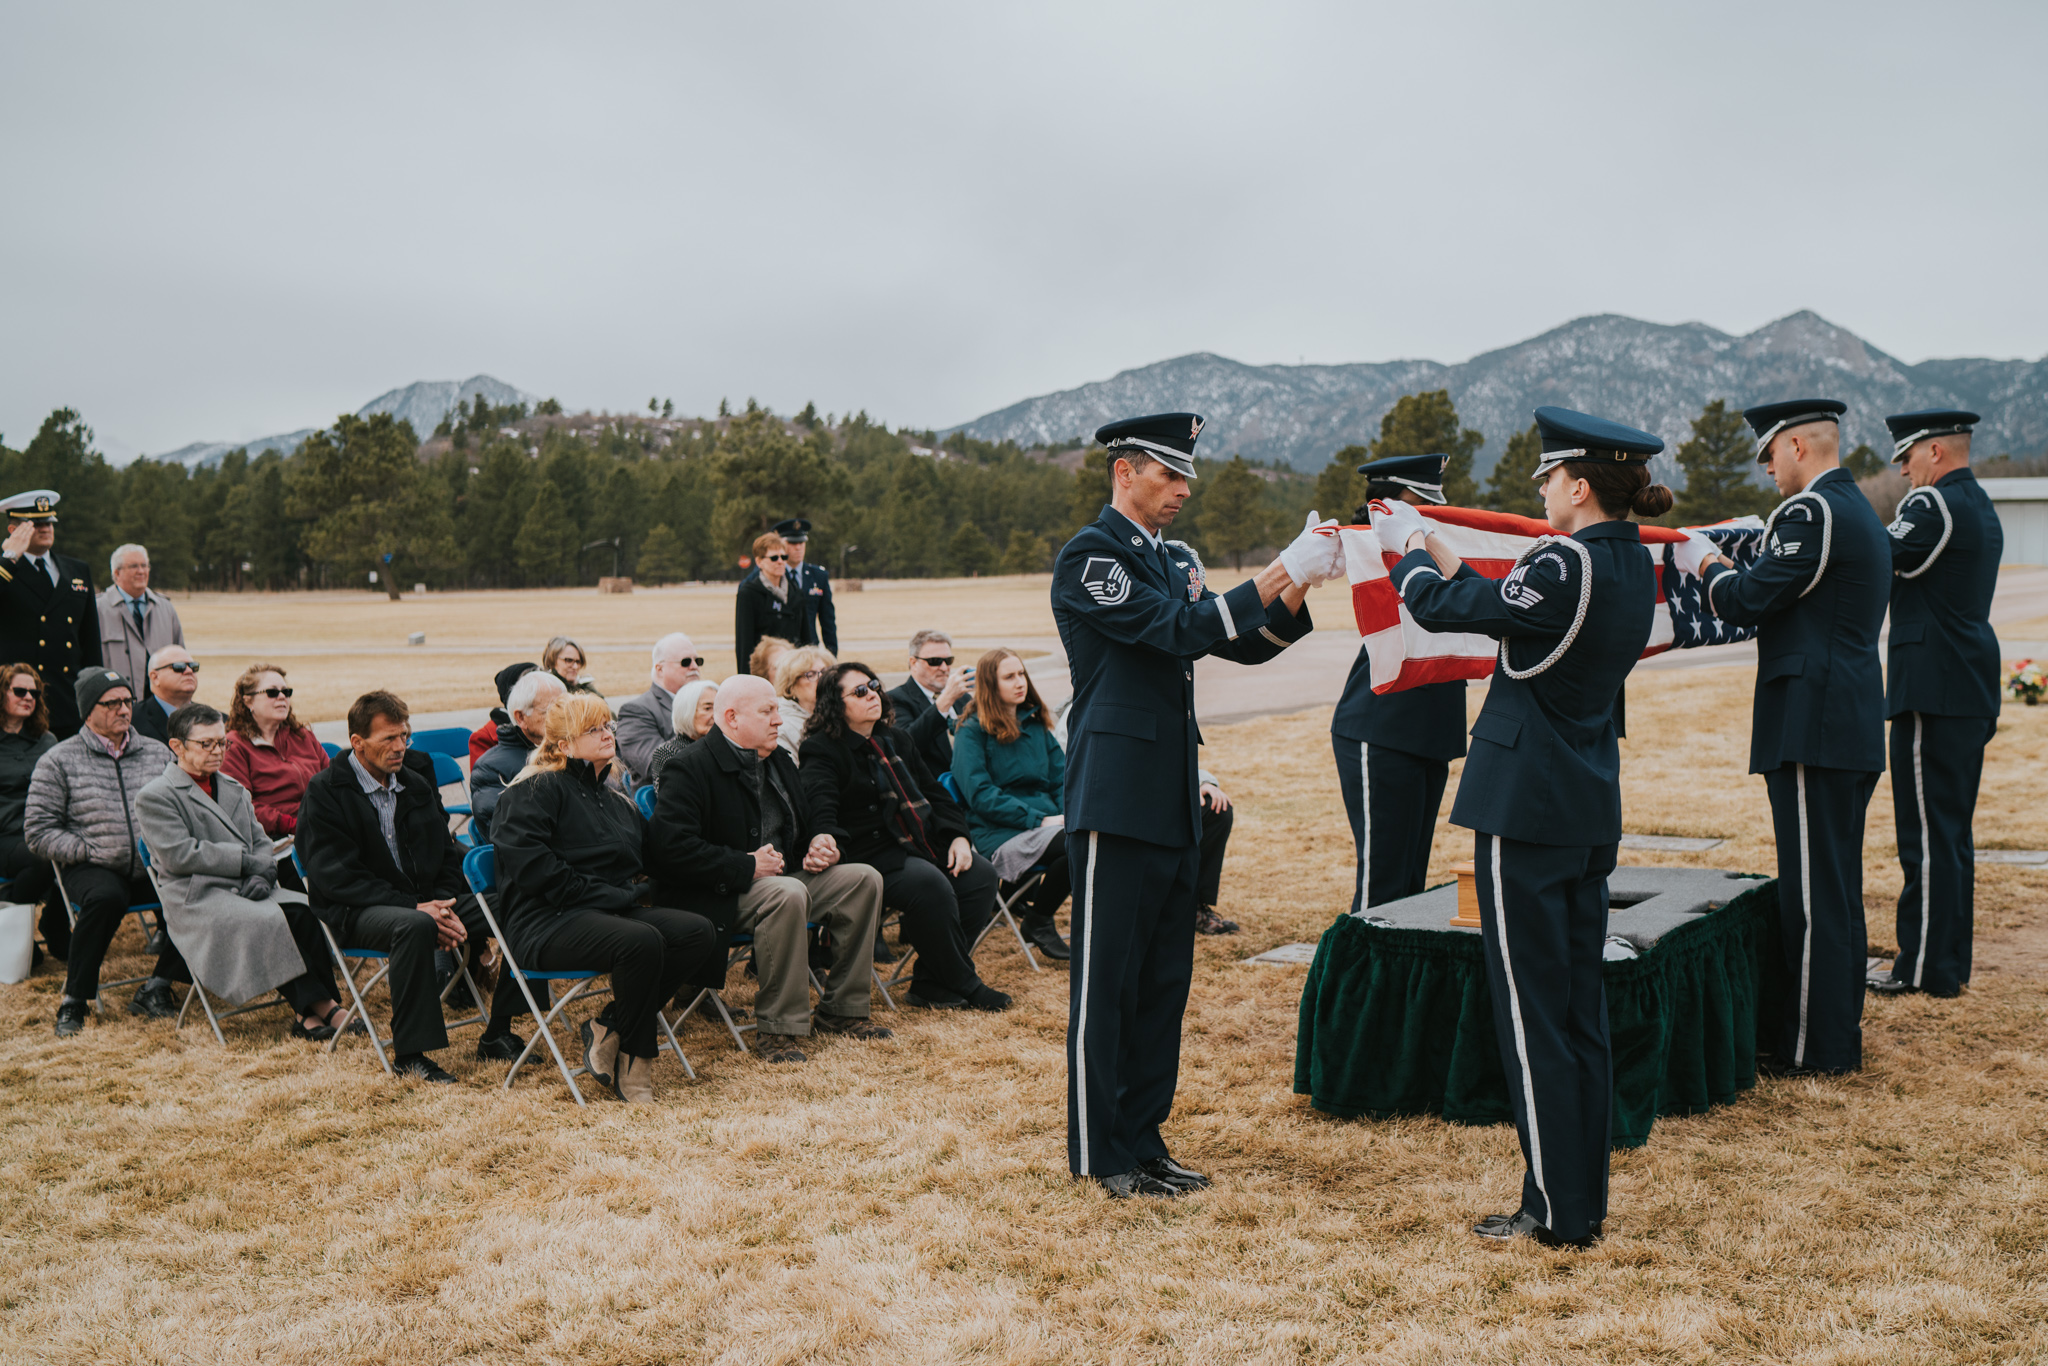 usafa-colorado-military-honours-burial-funeral-photography-grace-elizabeth-colchester-essex-alternative-wedding-lifestyle-photographer (43 of 127).jpg